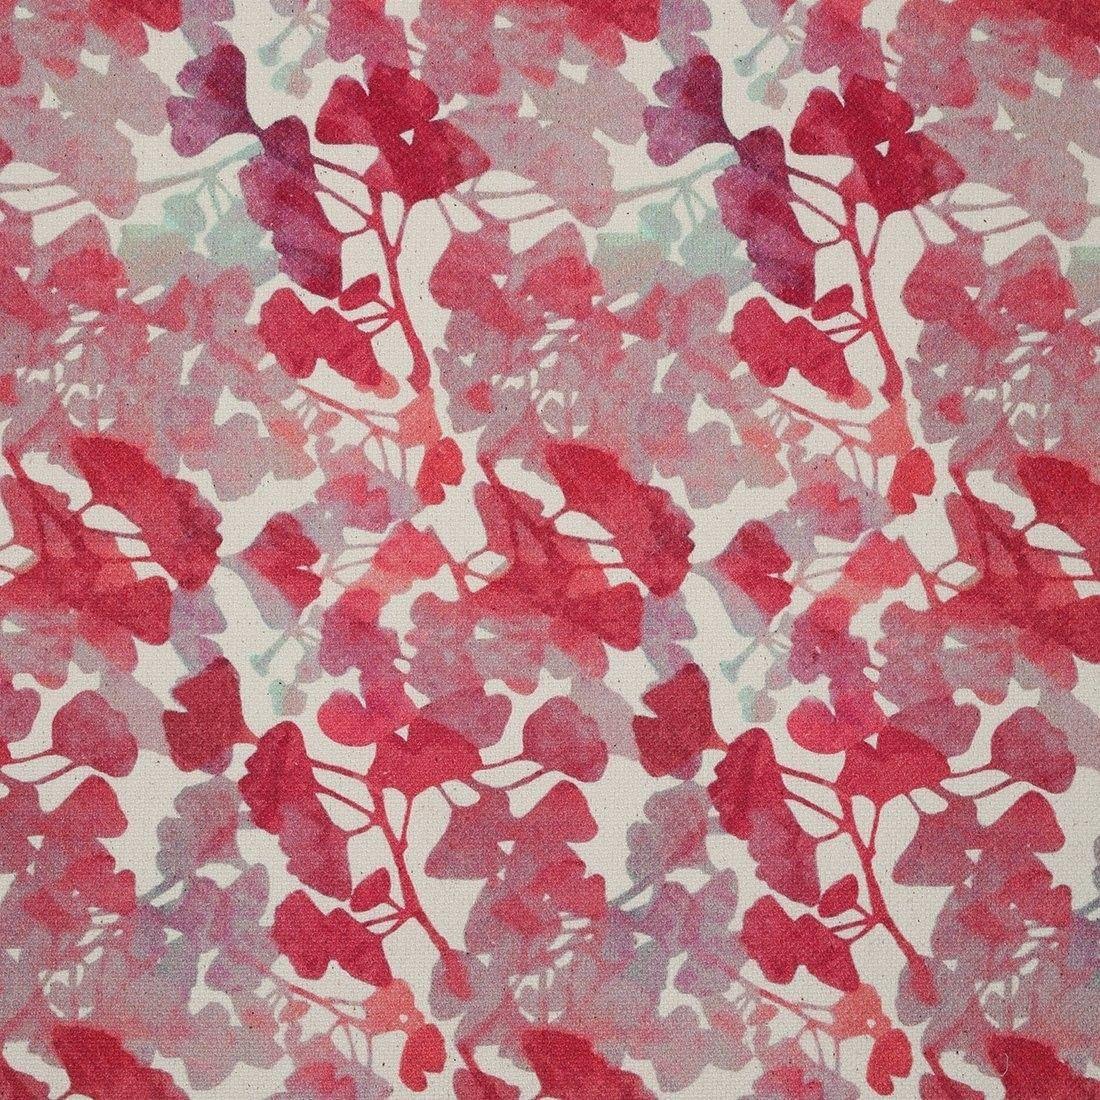 Tissu Coton Epais Aquarelle Rose Hubson Aquarelle Rose Motifs